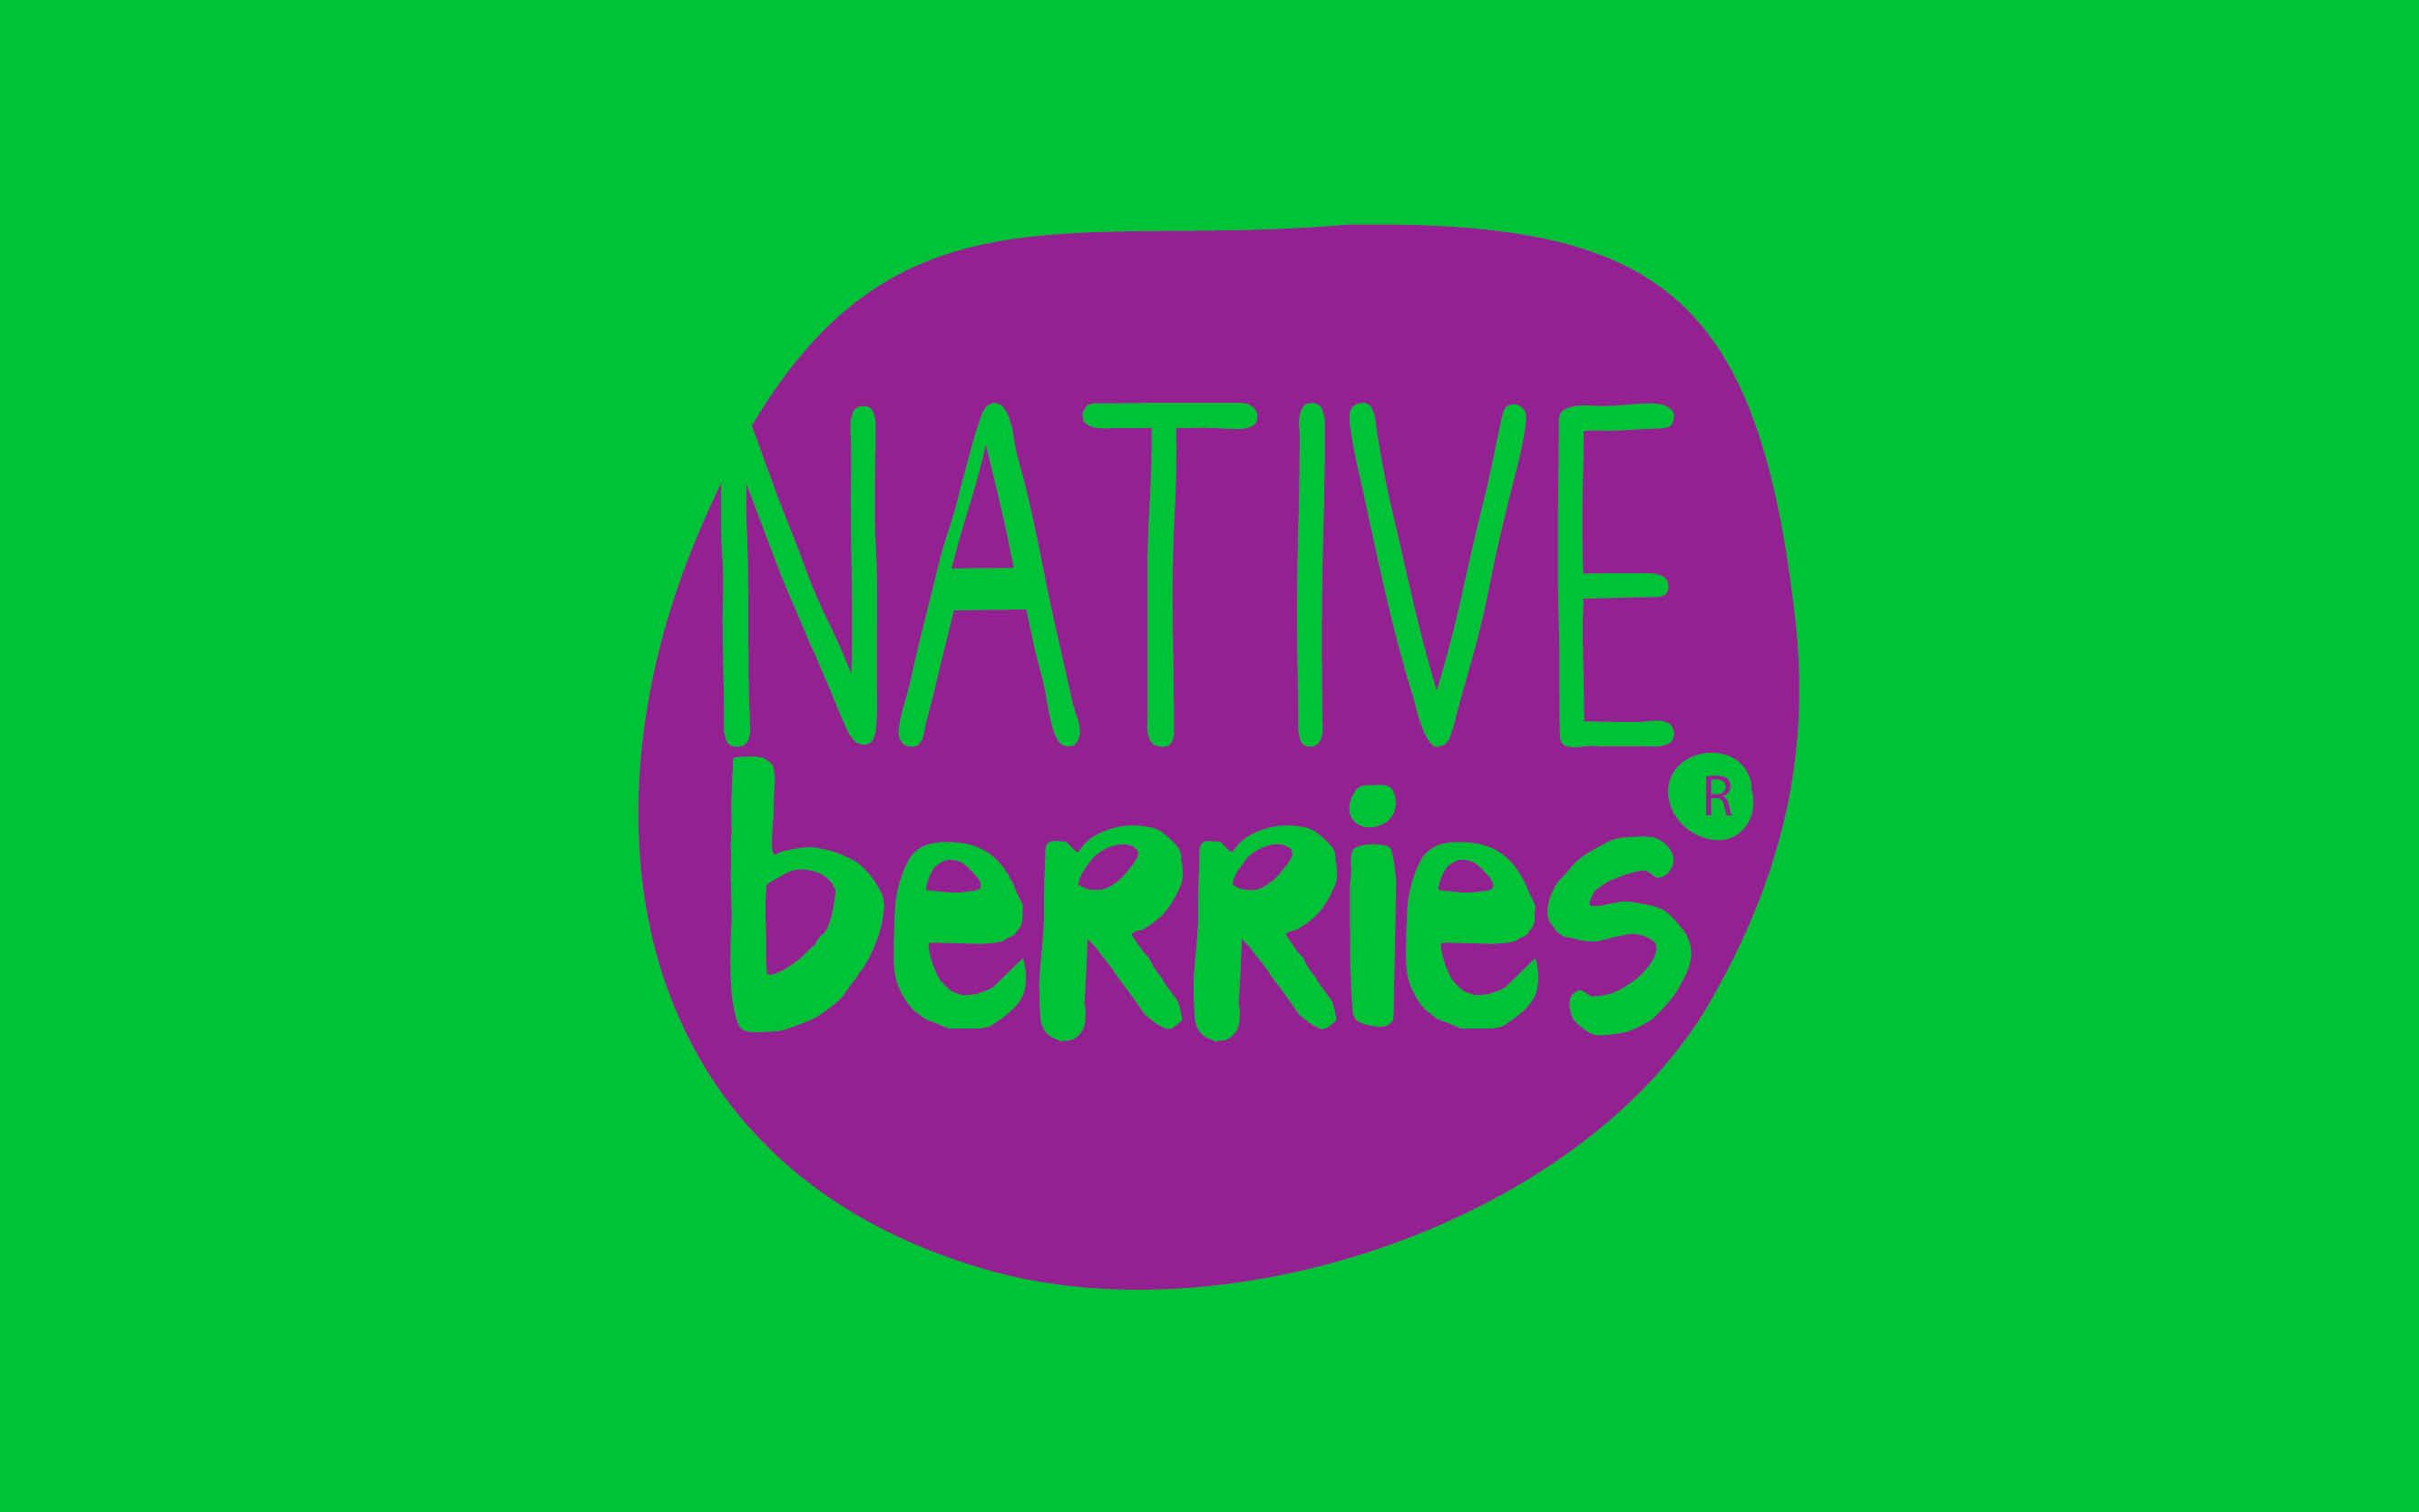 Native Berries